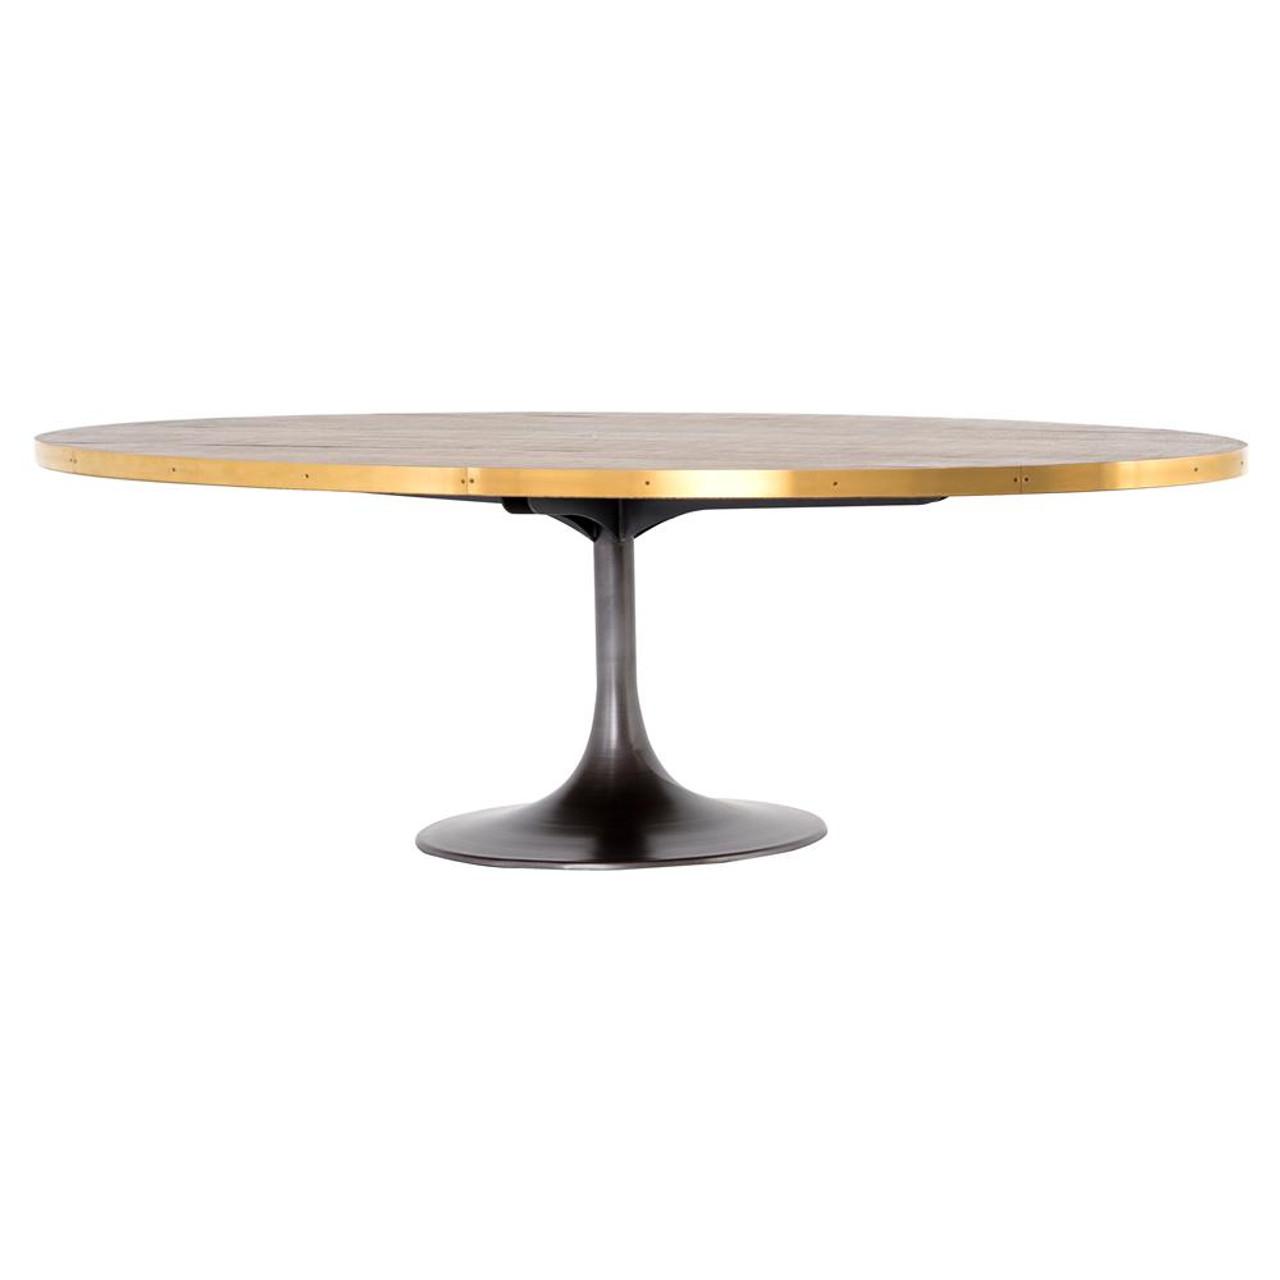 47056b87fd25 Evans Industrial Tulip Oak Wood Top Oval Dining Table 98